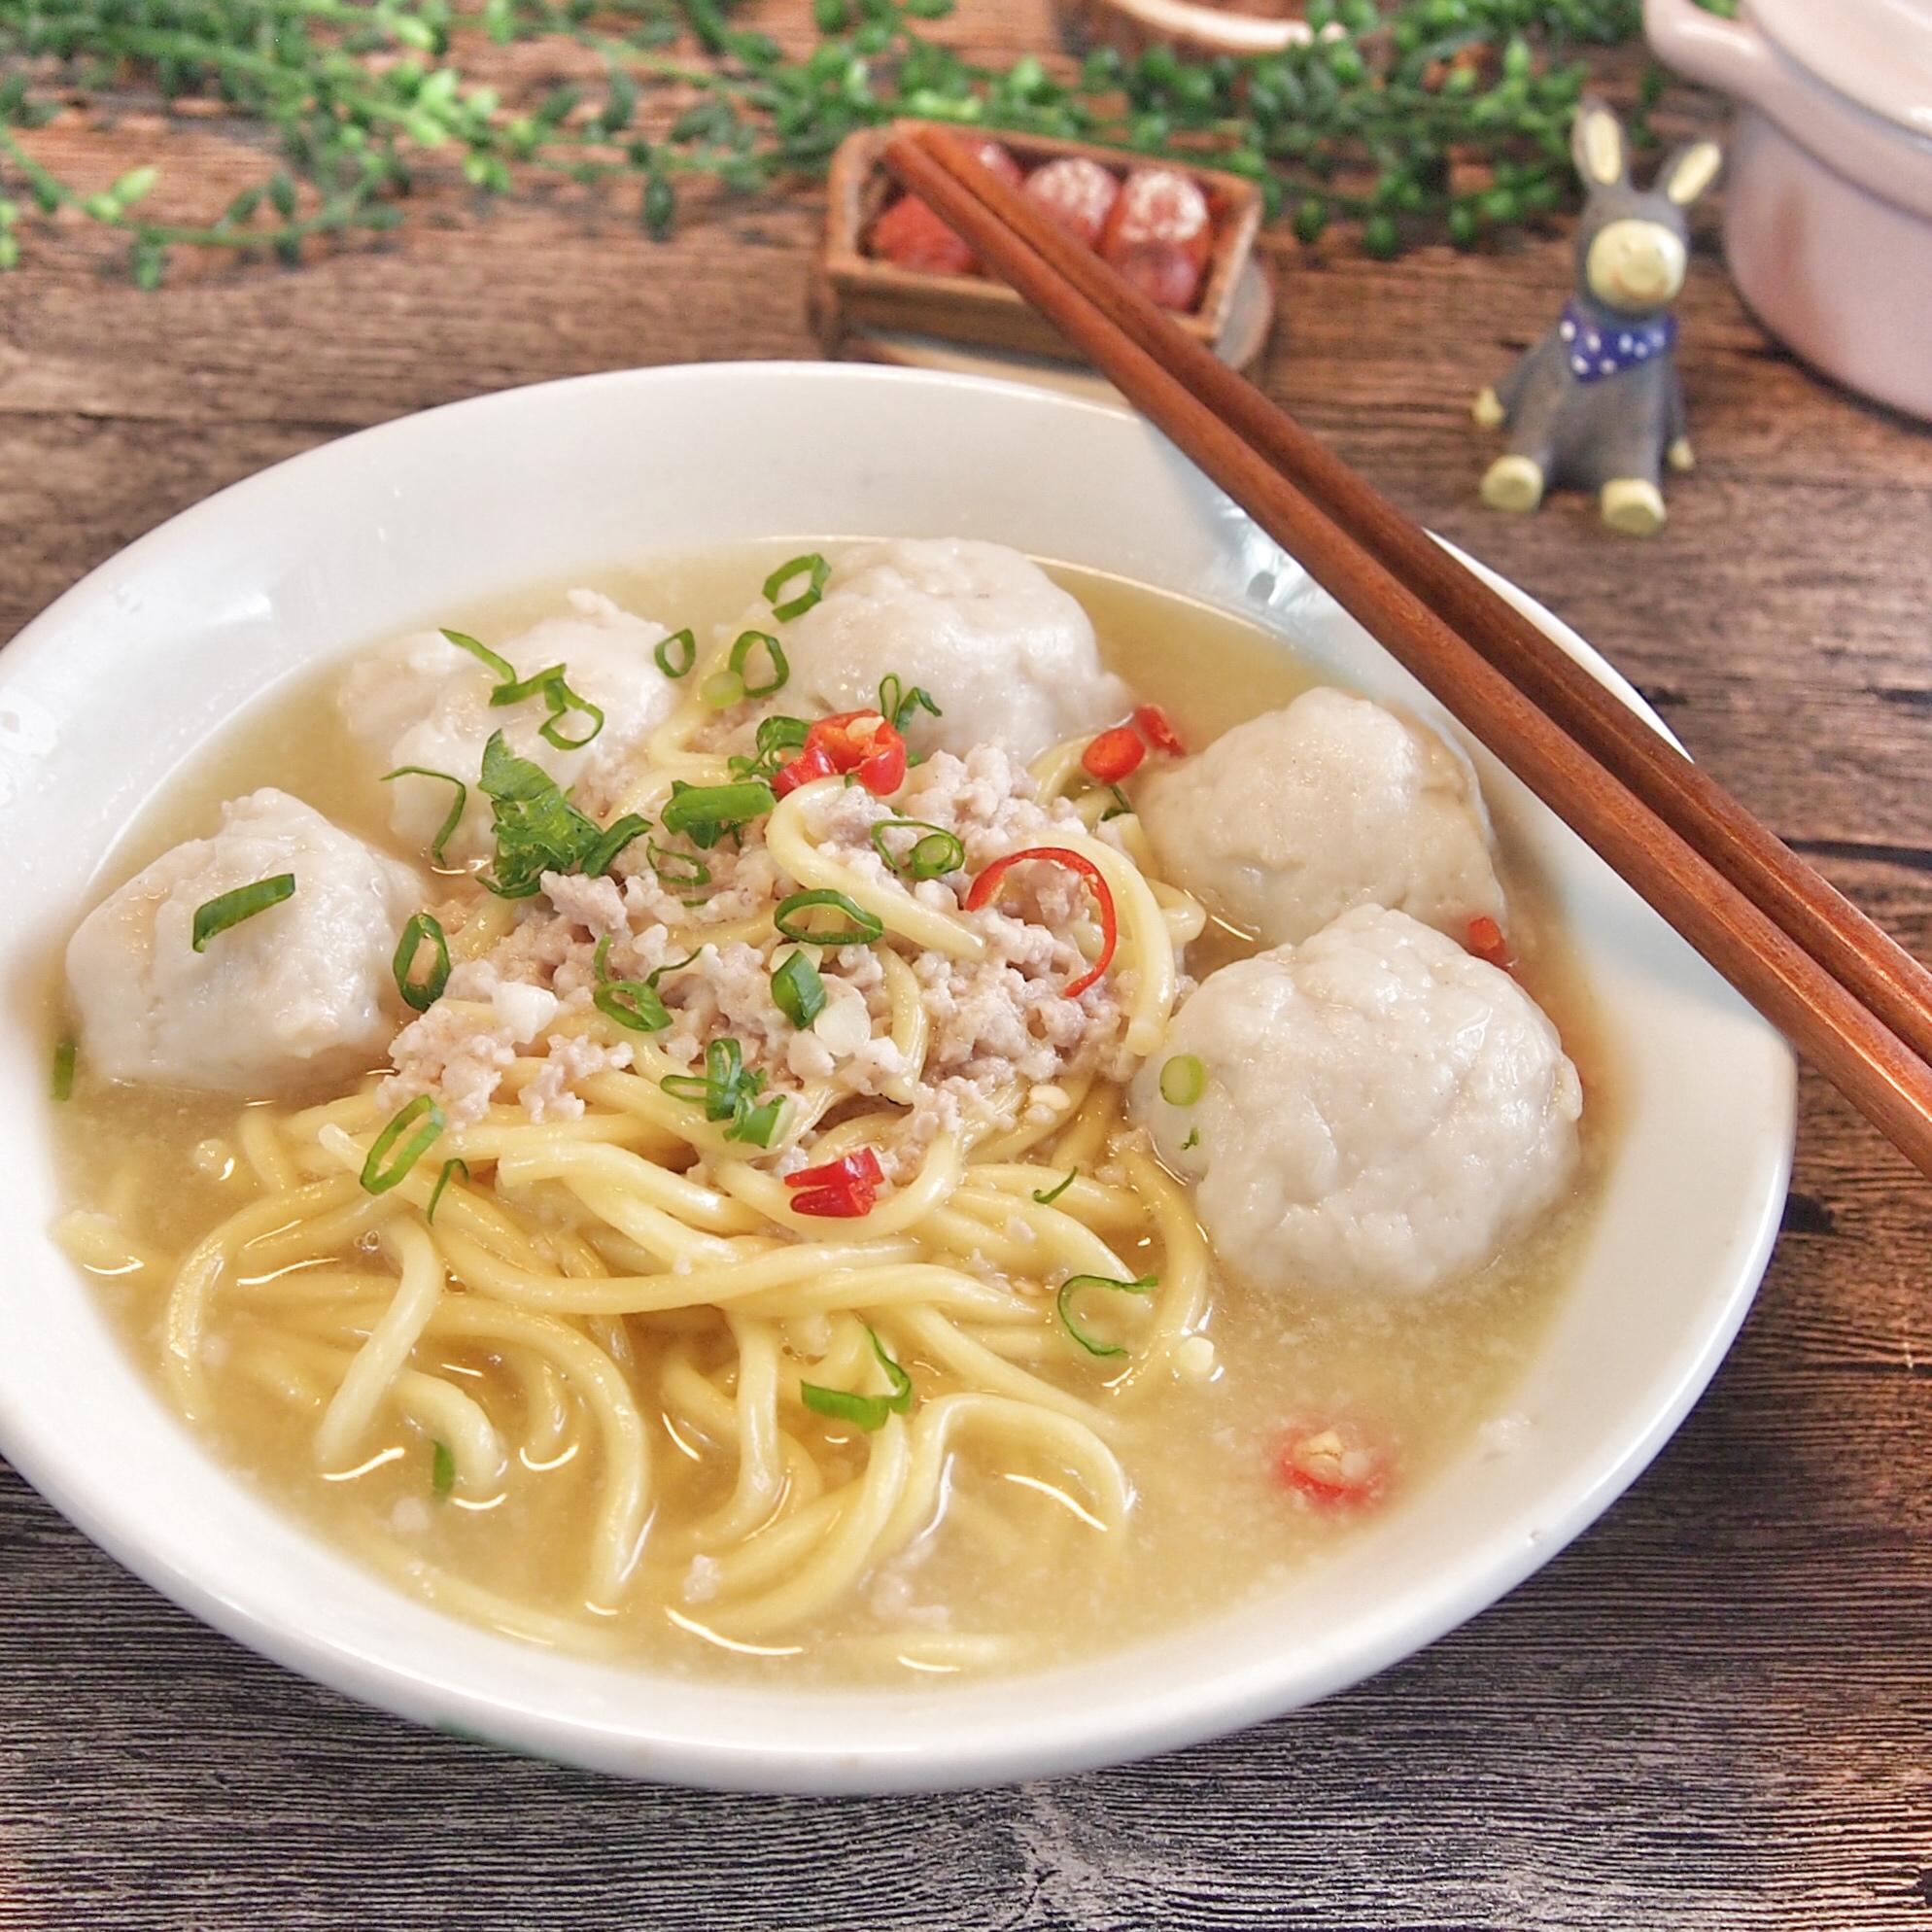 Singapore's Favourite Teochew Fishball Noodle Soup 潮州鱼圆面汤